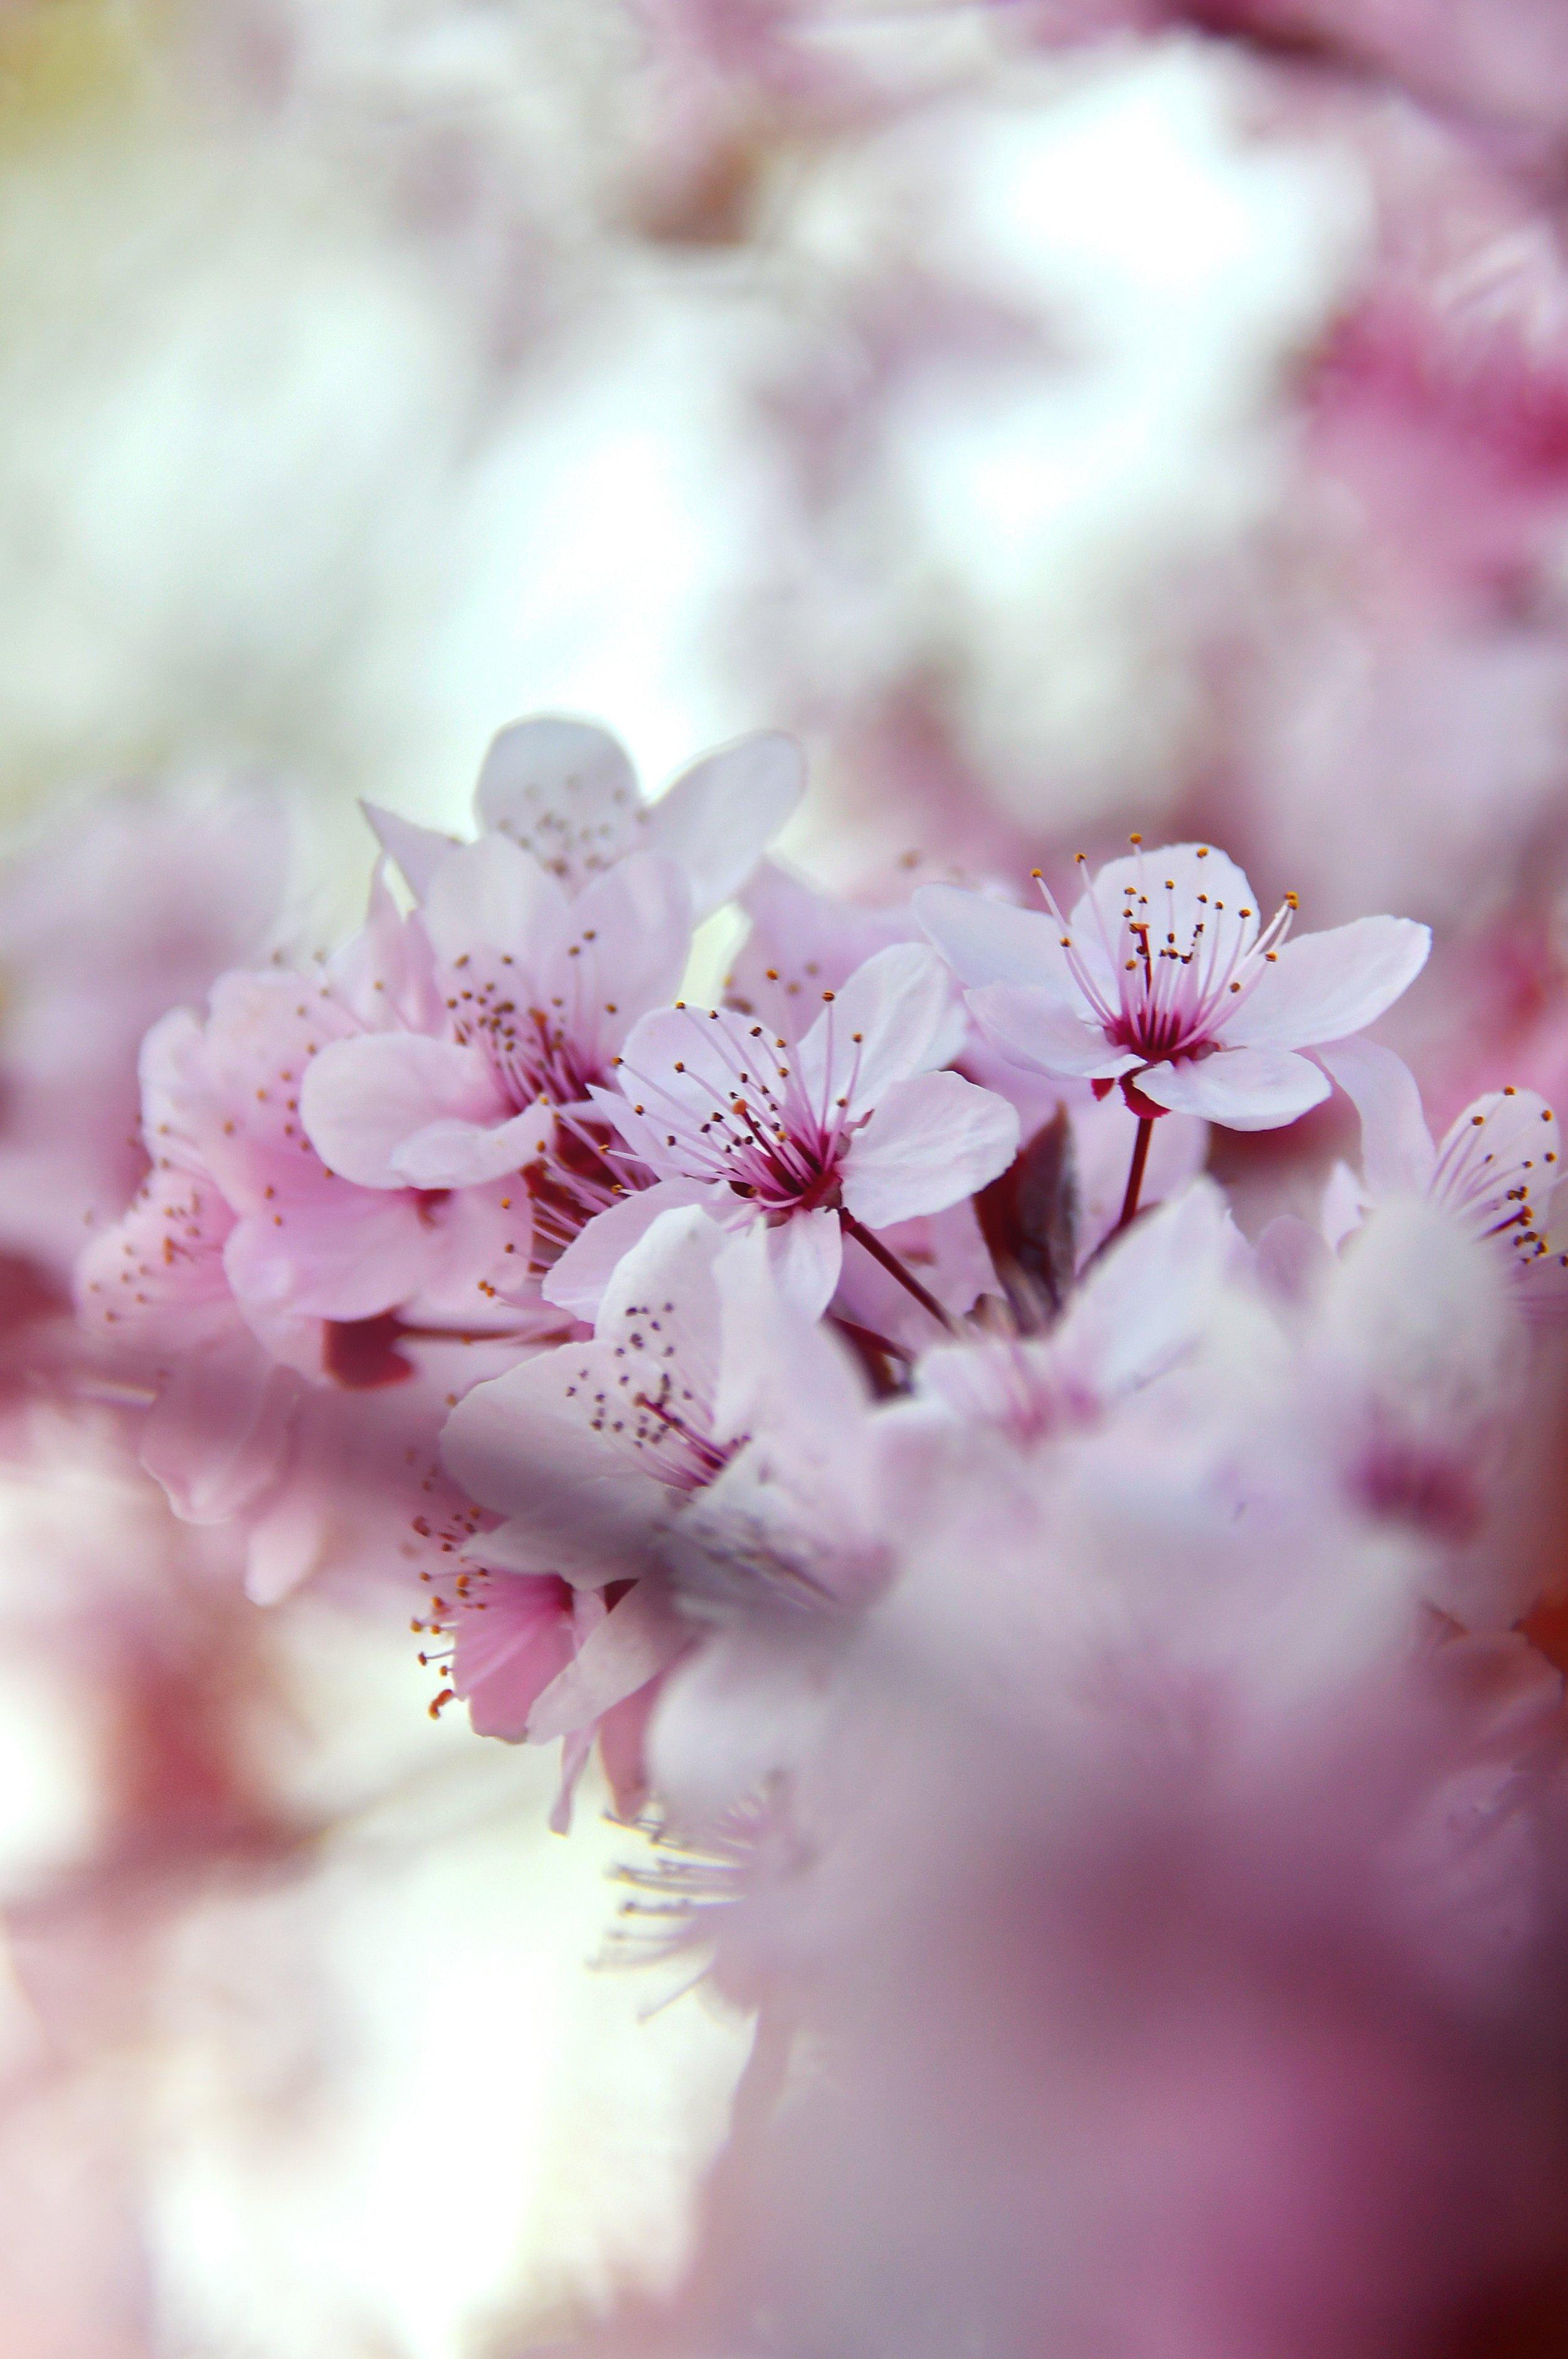 beautiful-beautiful-flowers-blooming-2080436.jpg